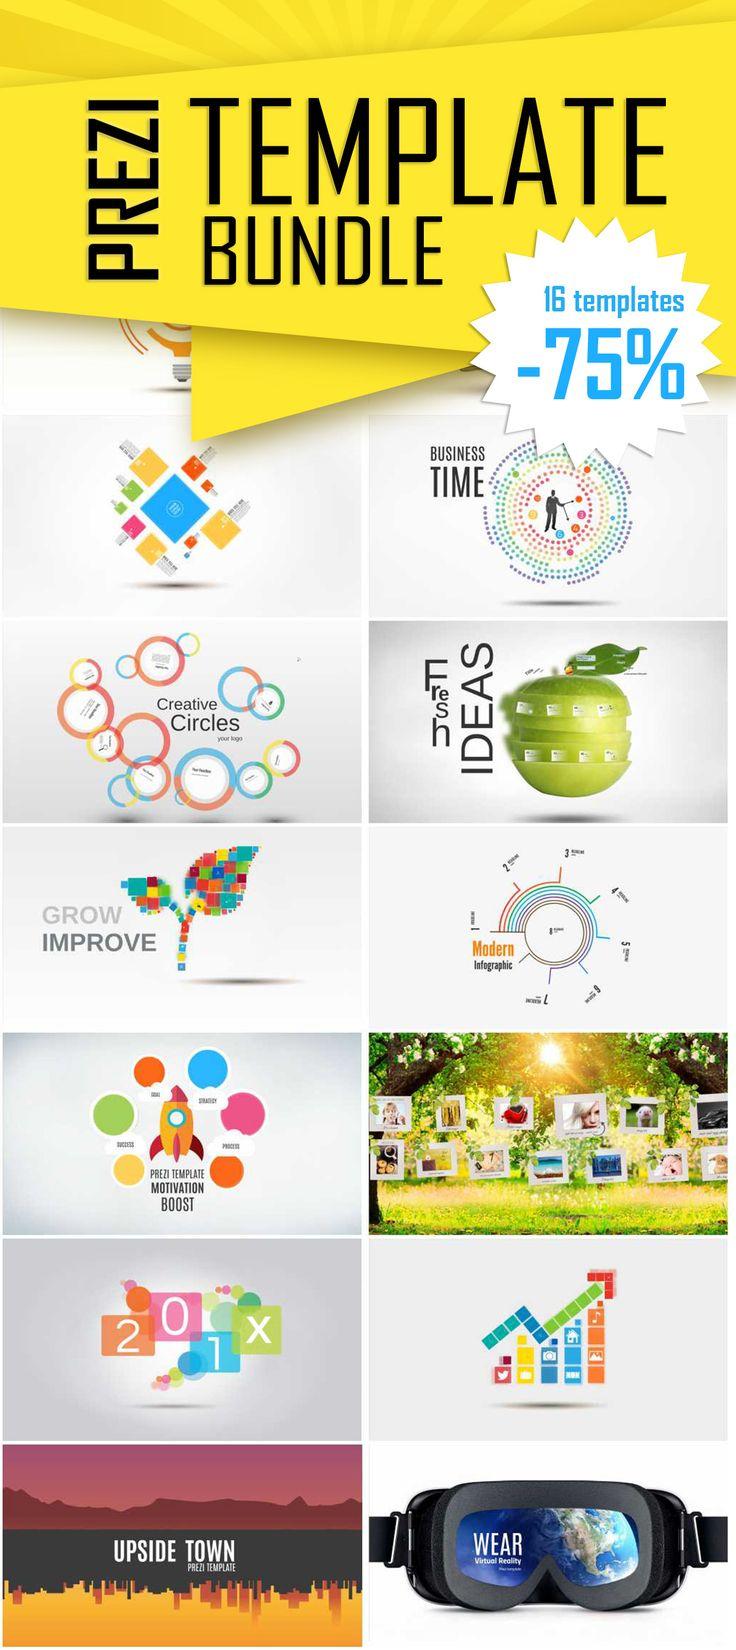 The 268 best Prezi templates by Pixelsmoothie images on Pinterest ...